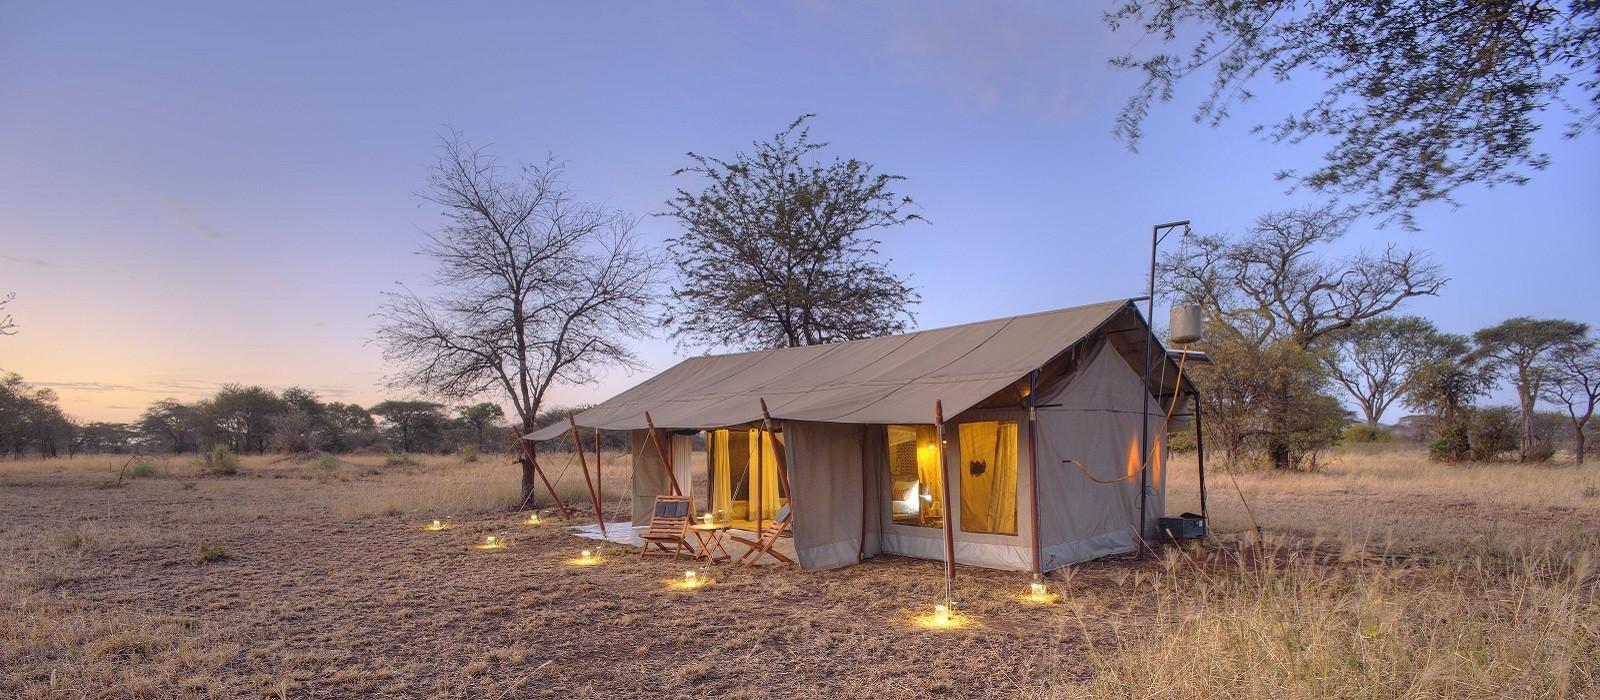 Hotel Ubuntu Migration Camp Tanzania